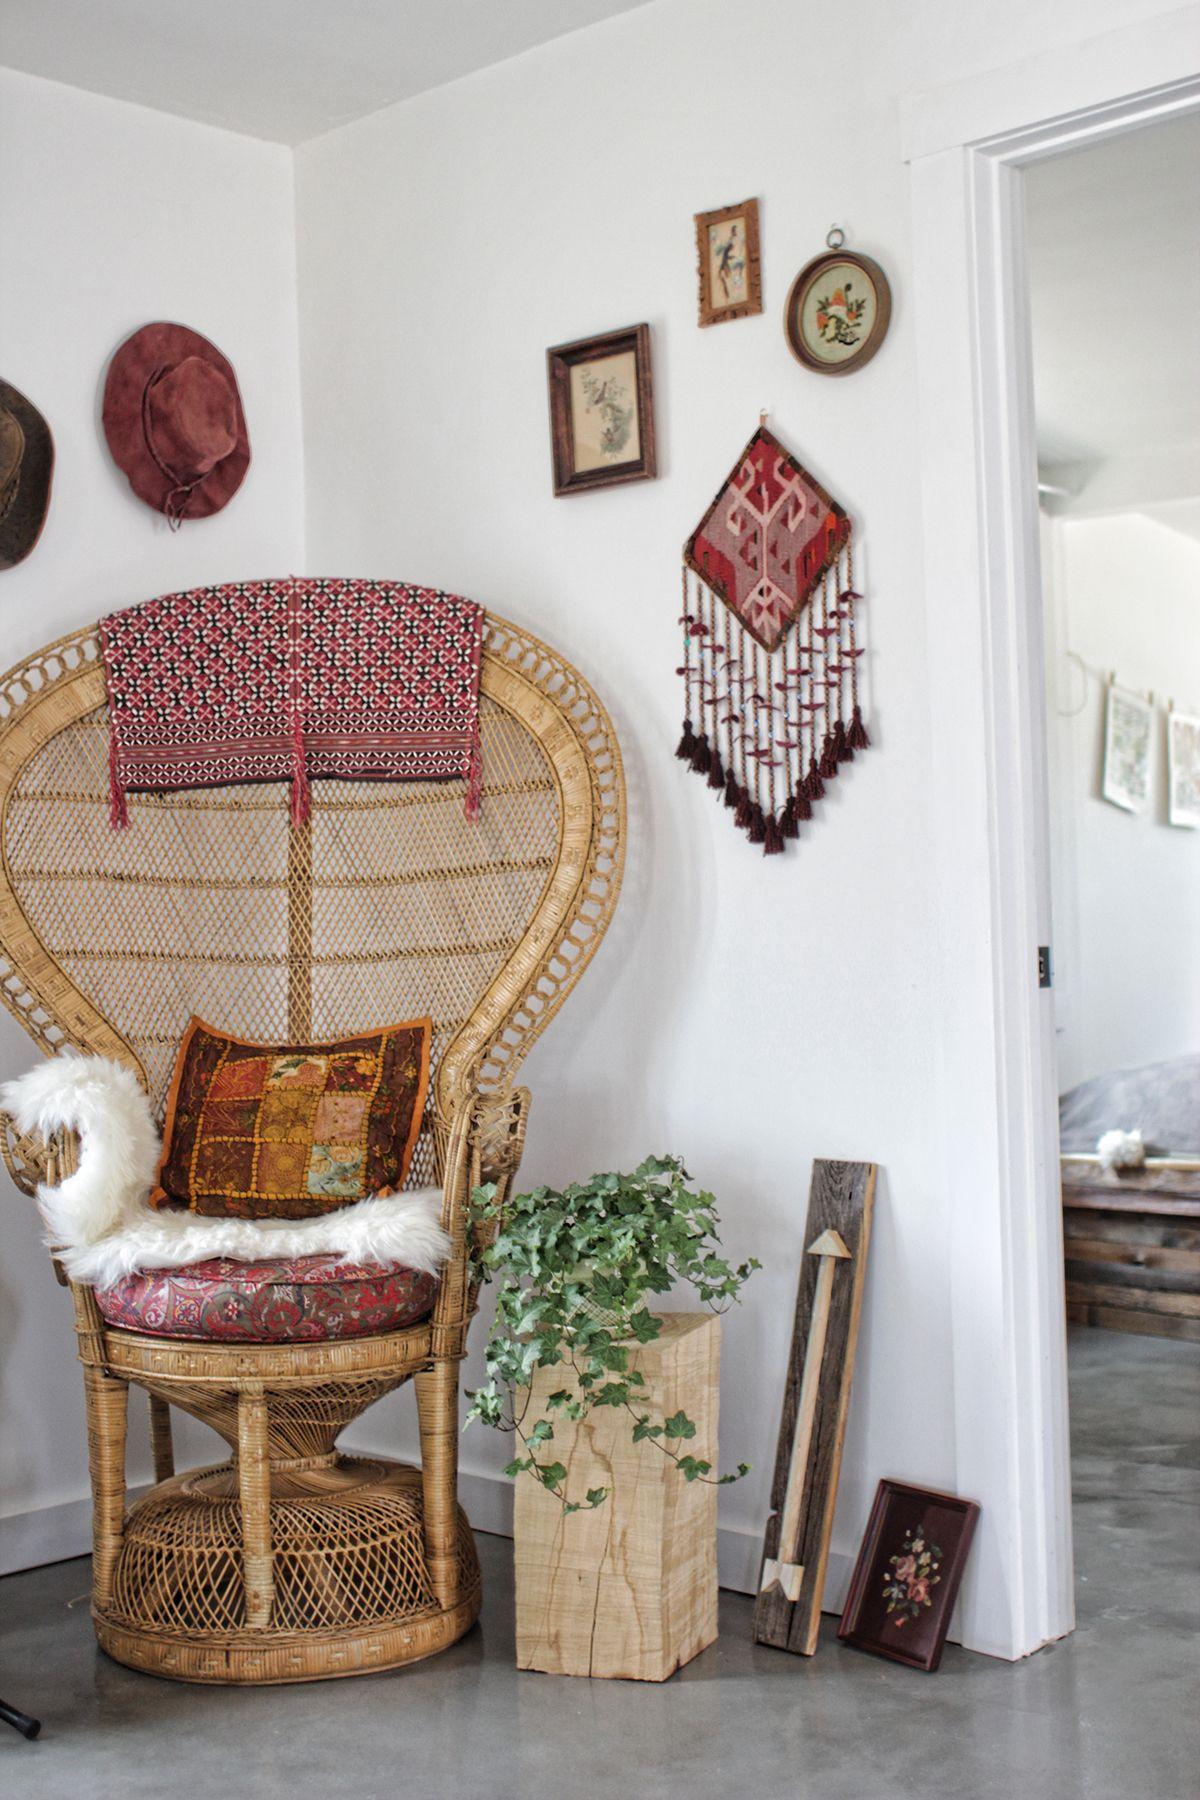 Peacock Chair | @invokethespirit